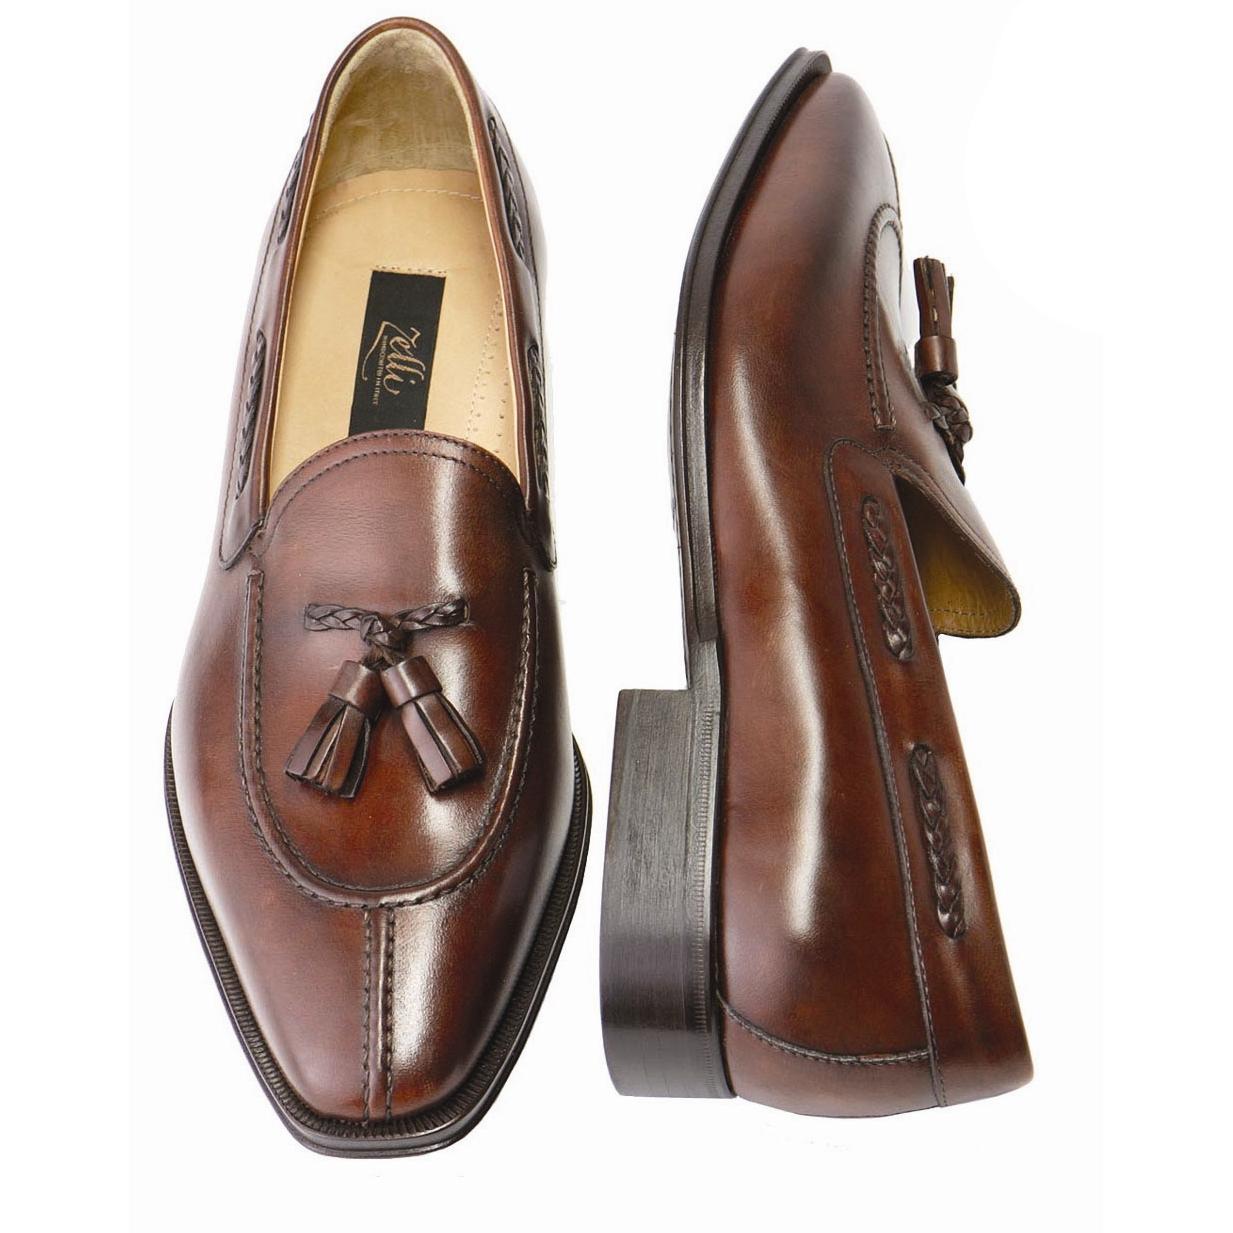 Leather Shoes Website Design Ideas